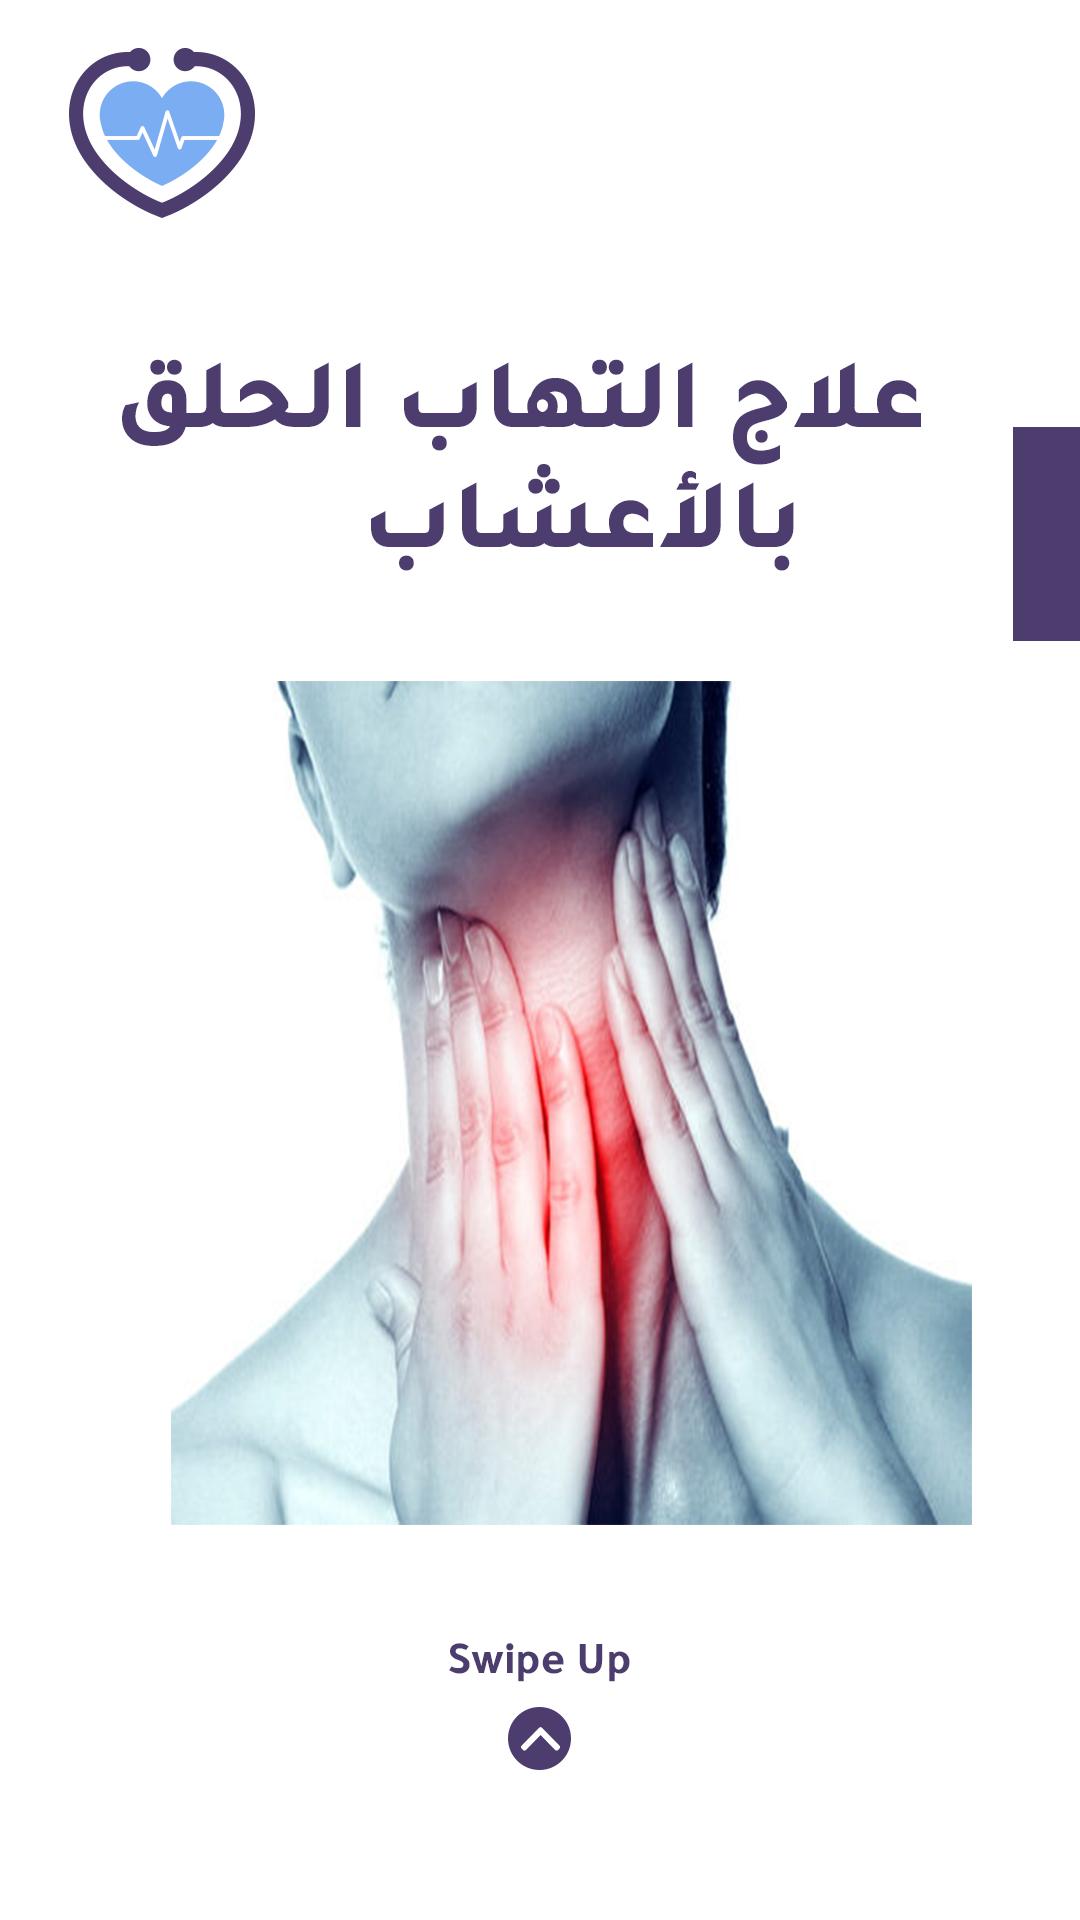 علاج التهاب الحلق بالhعشاب Movie Posters Movies Poster